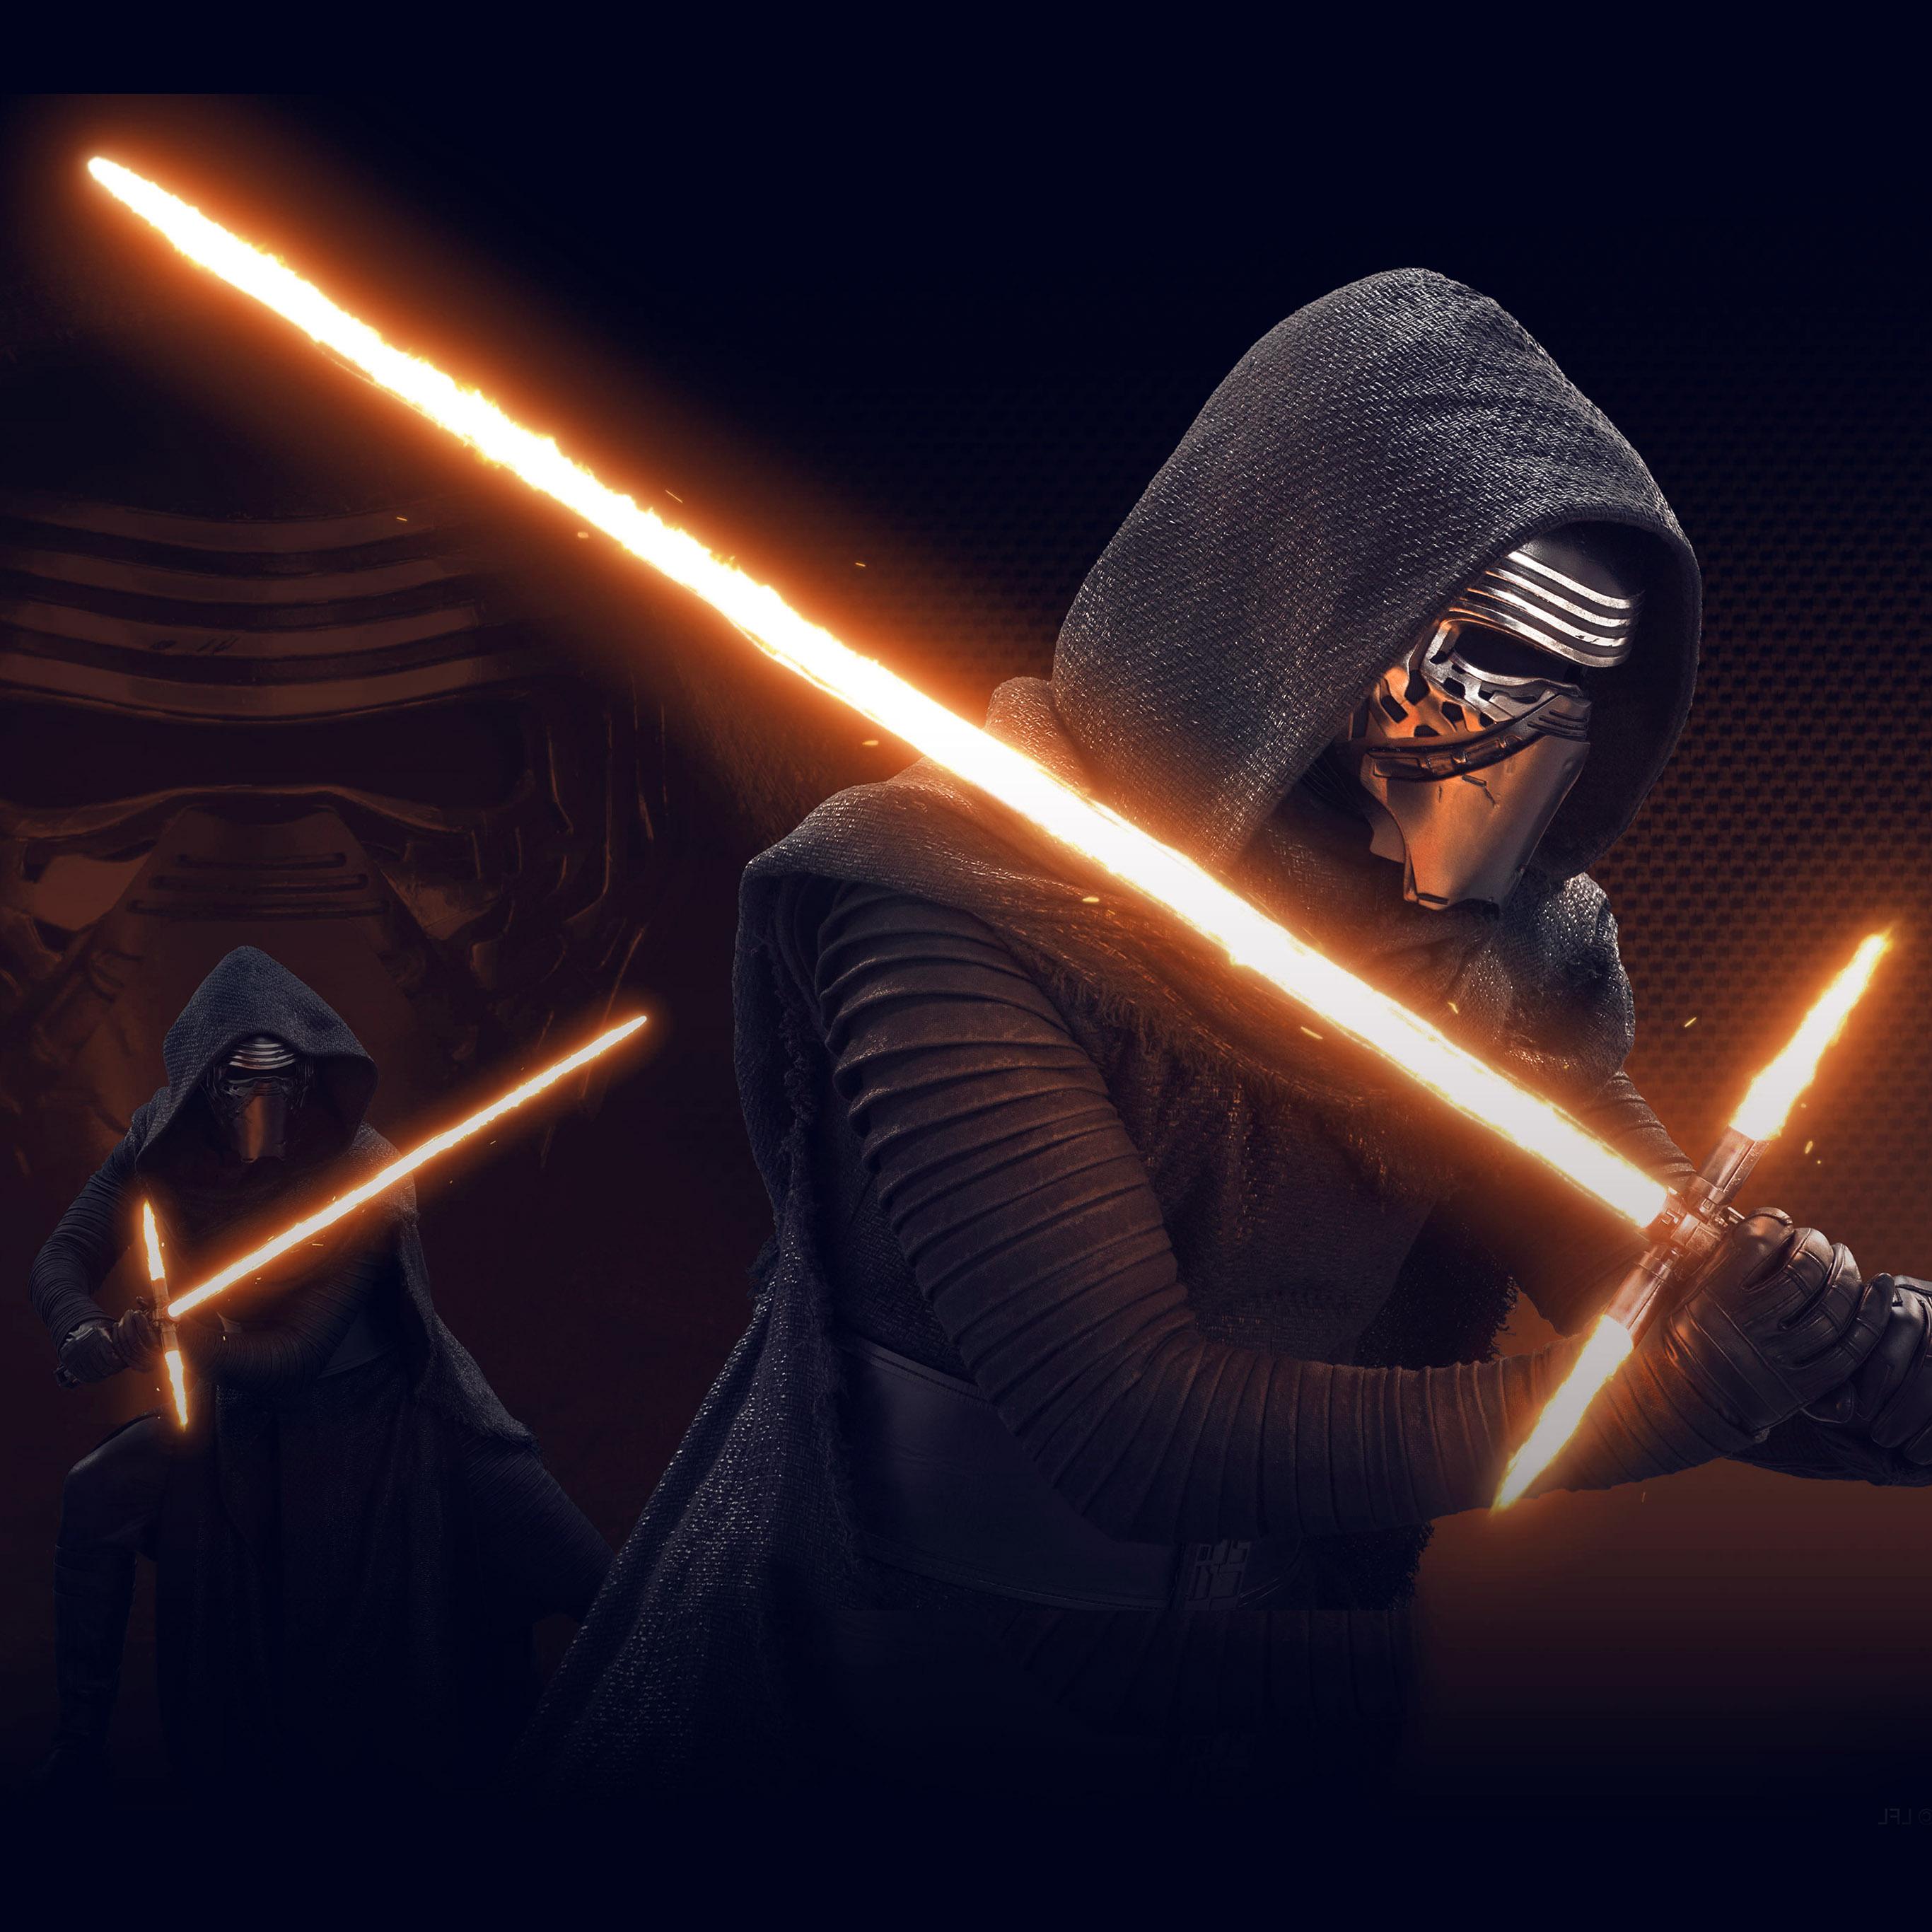 At11 Starwars Kylo Ren Dark Orange Lightsaber Art Illustration Wallpaper